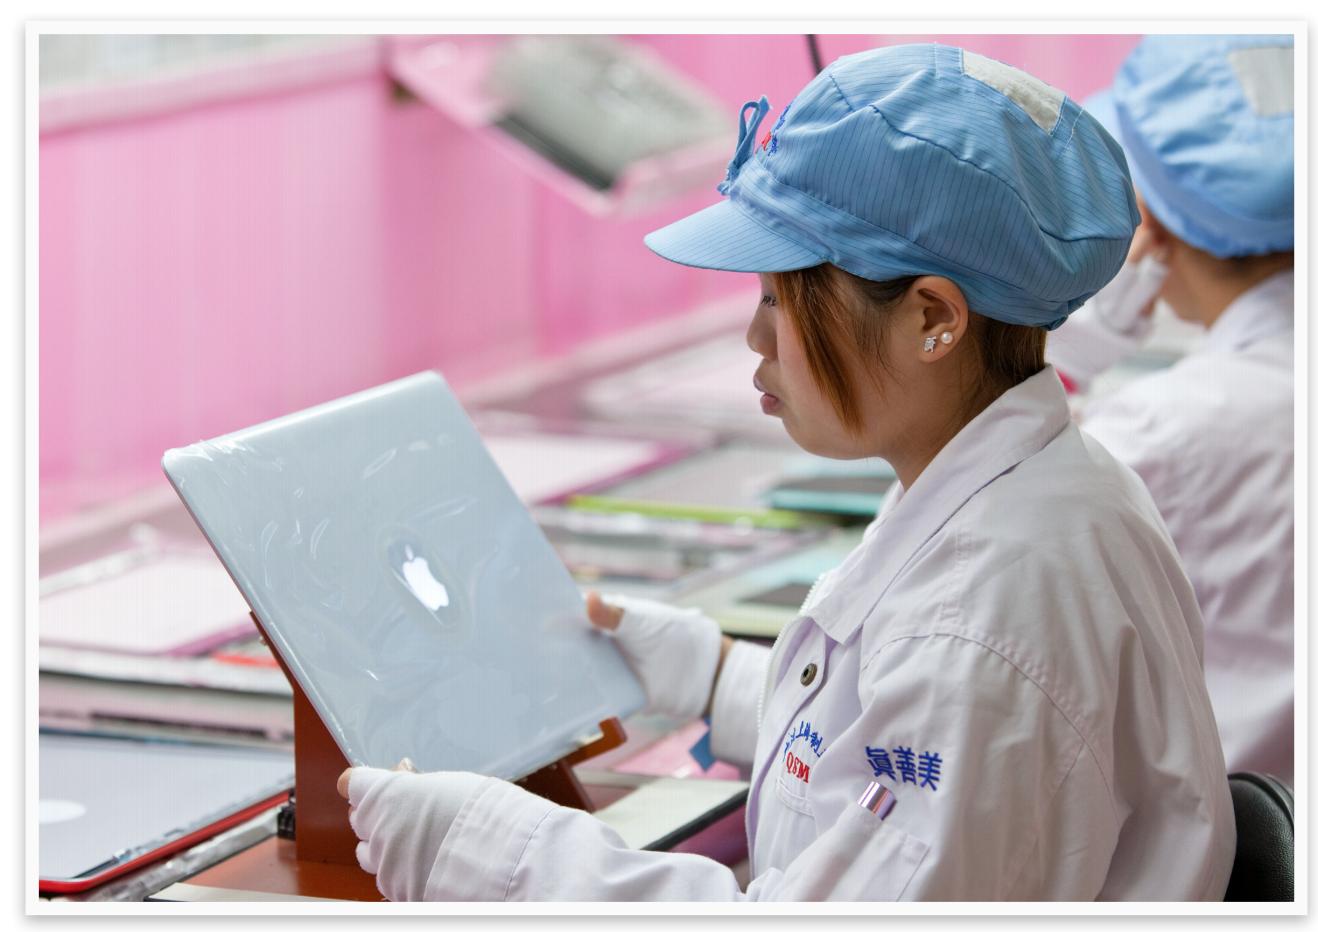 Apple-supplierresponsibility- report-2013